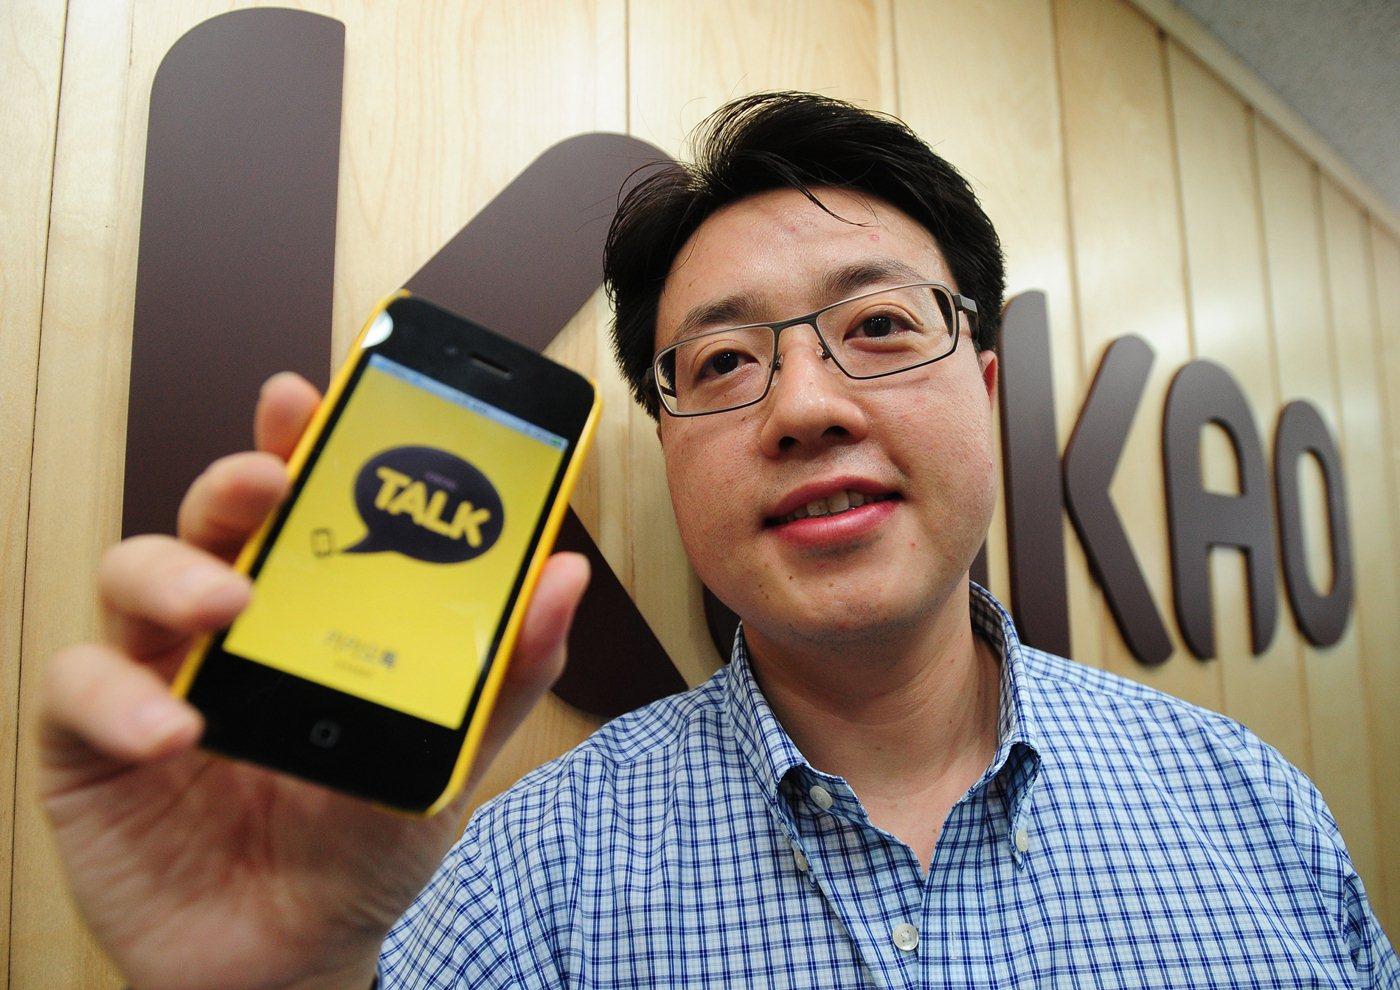 Korean messaging company Kakao partners with Yahoo Japan, eying larger Japanese profile